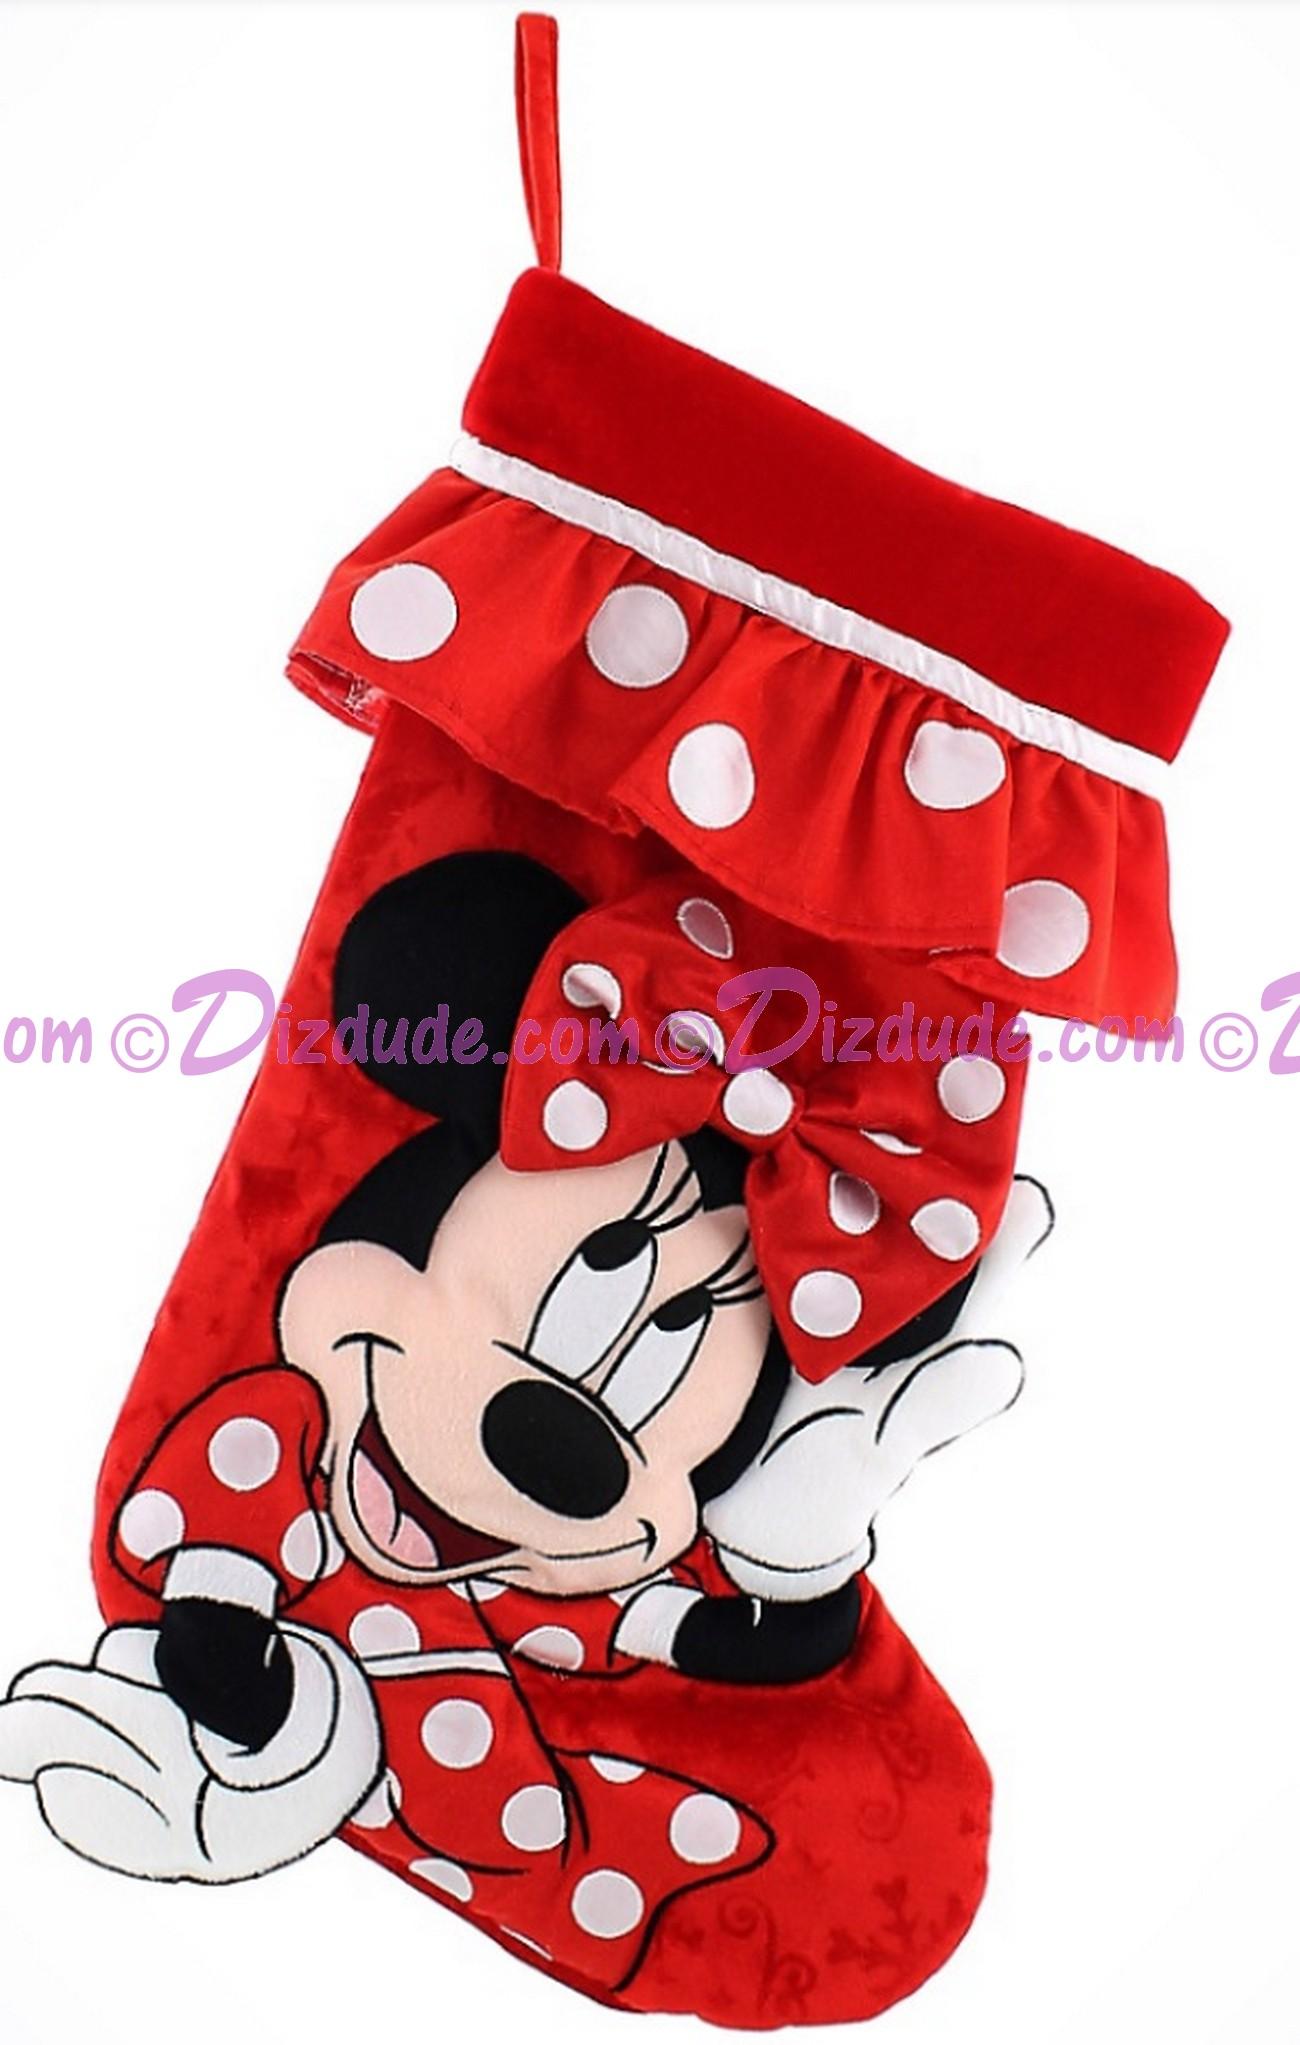 Disney Minnie Mouse Plush Christmas Stocking © Dizdude.com